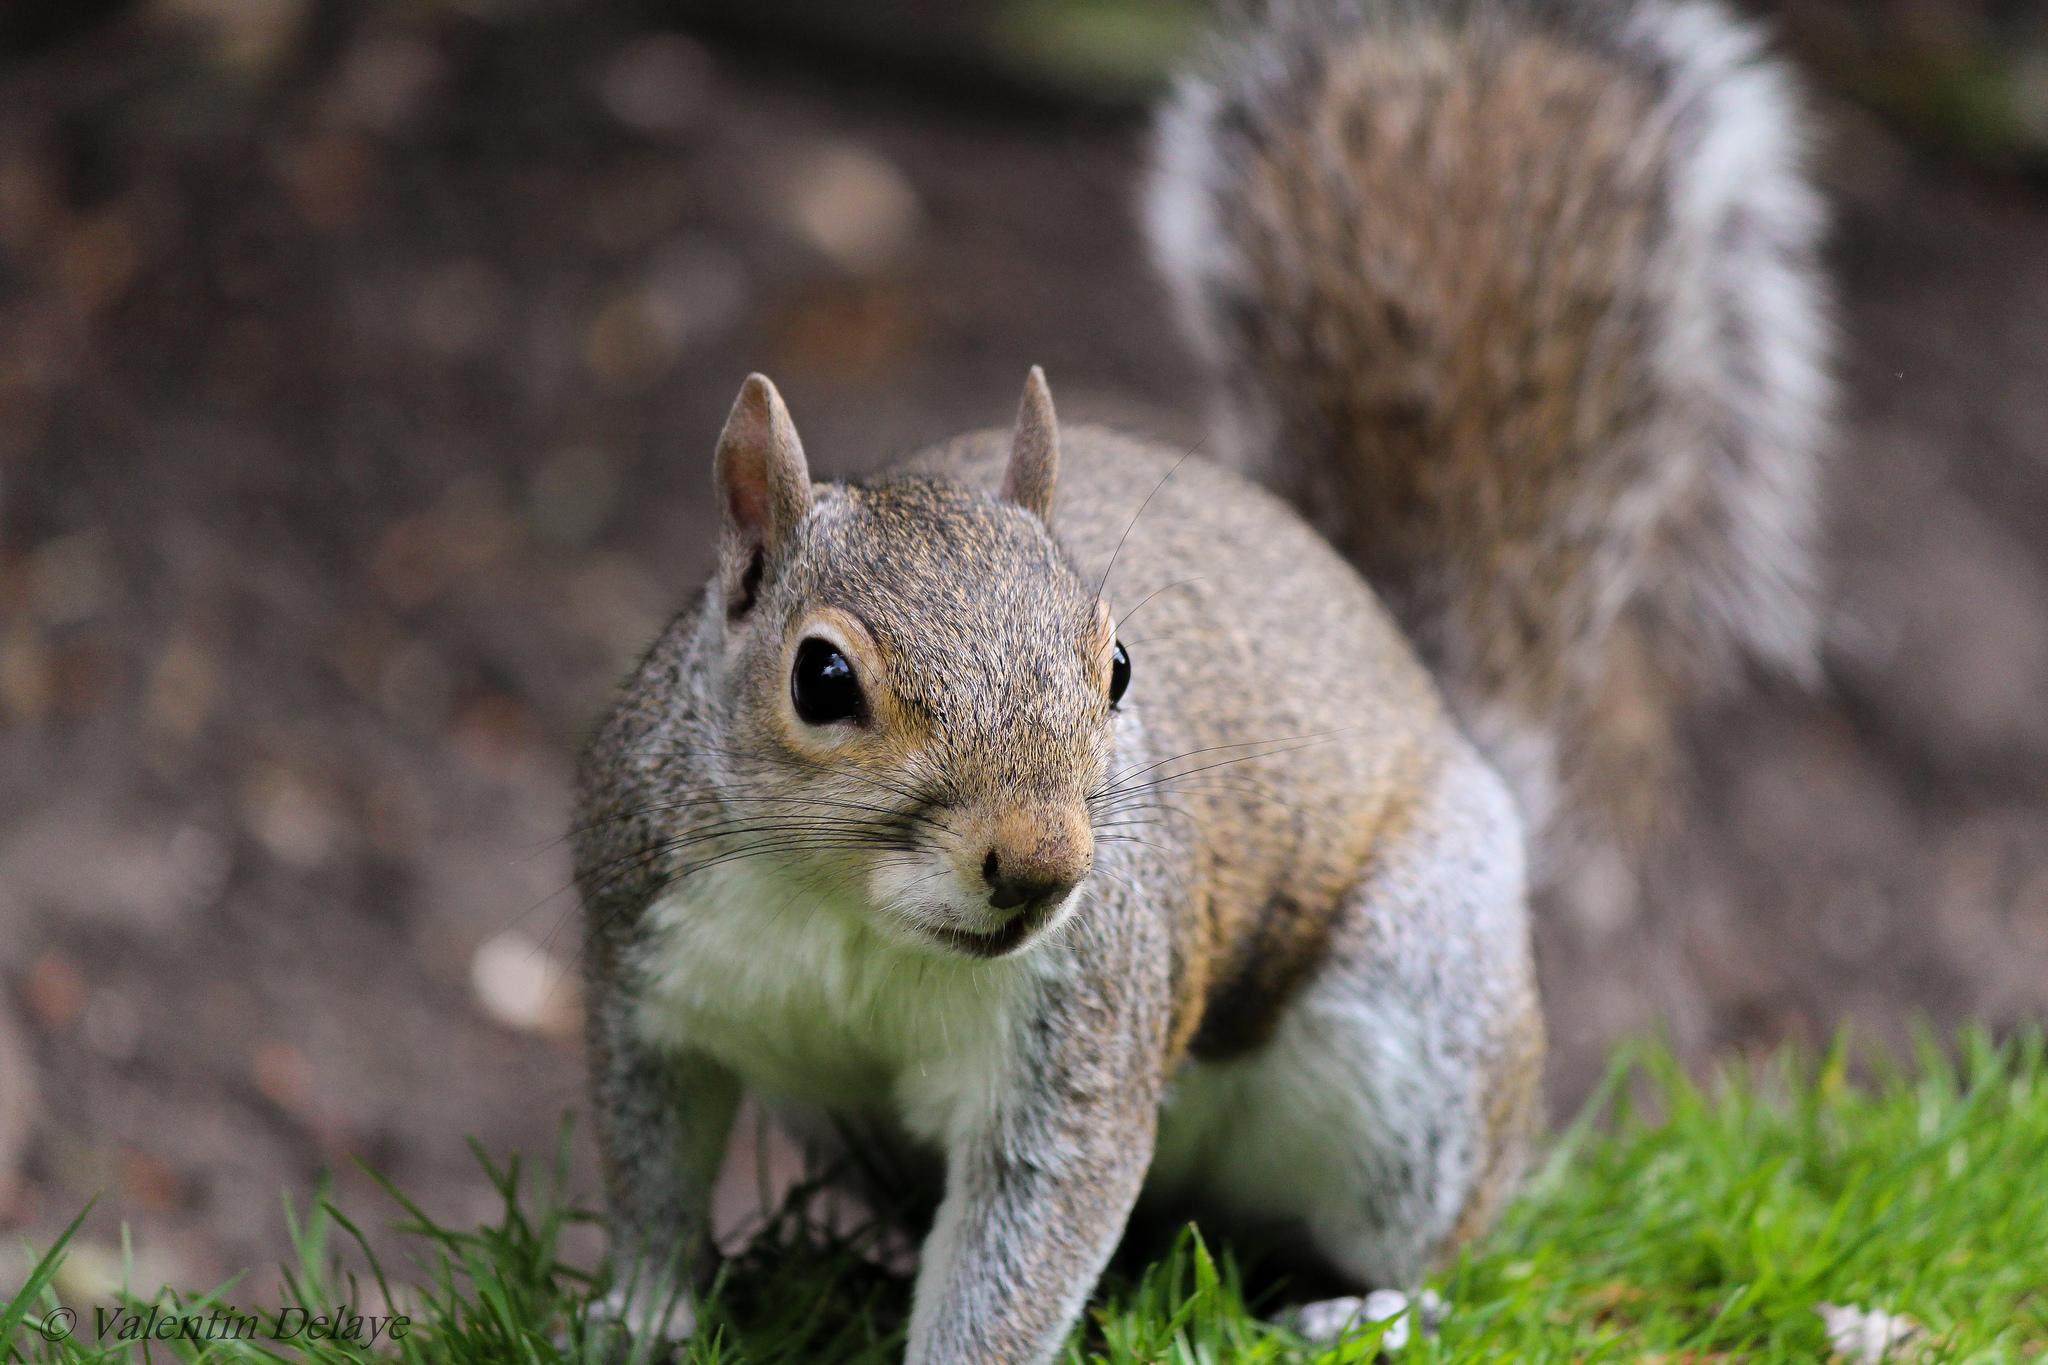 Squirrel by Valentin Delaye, on Flickr